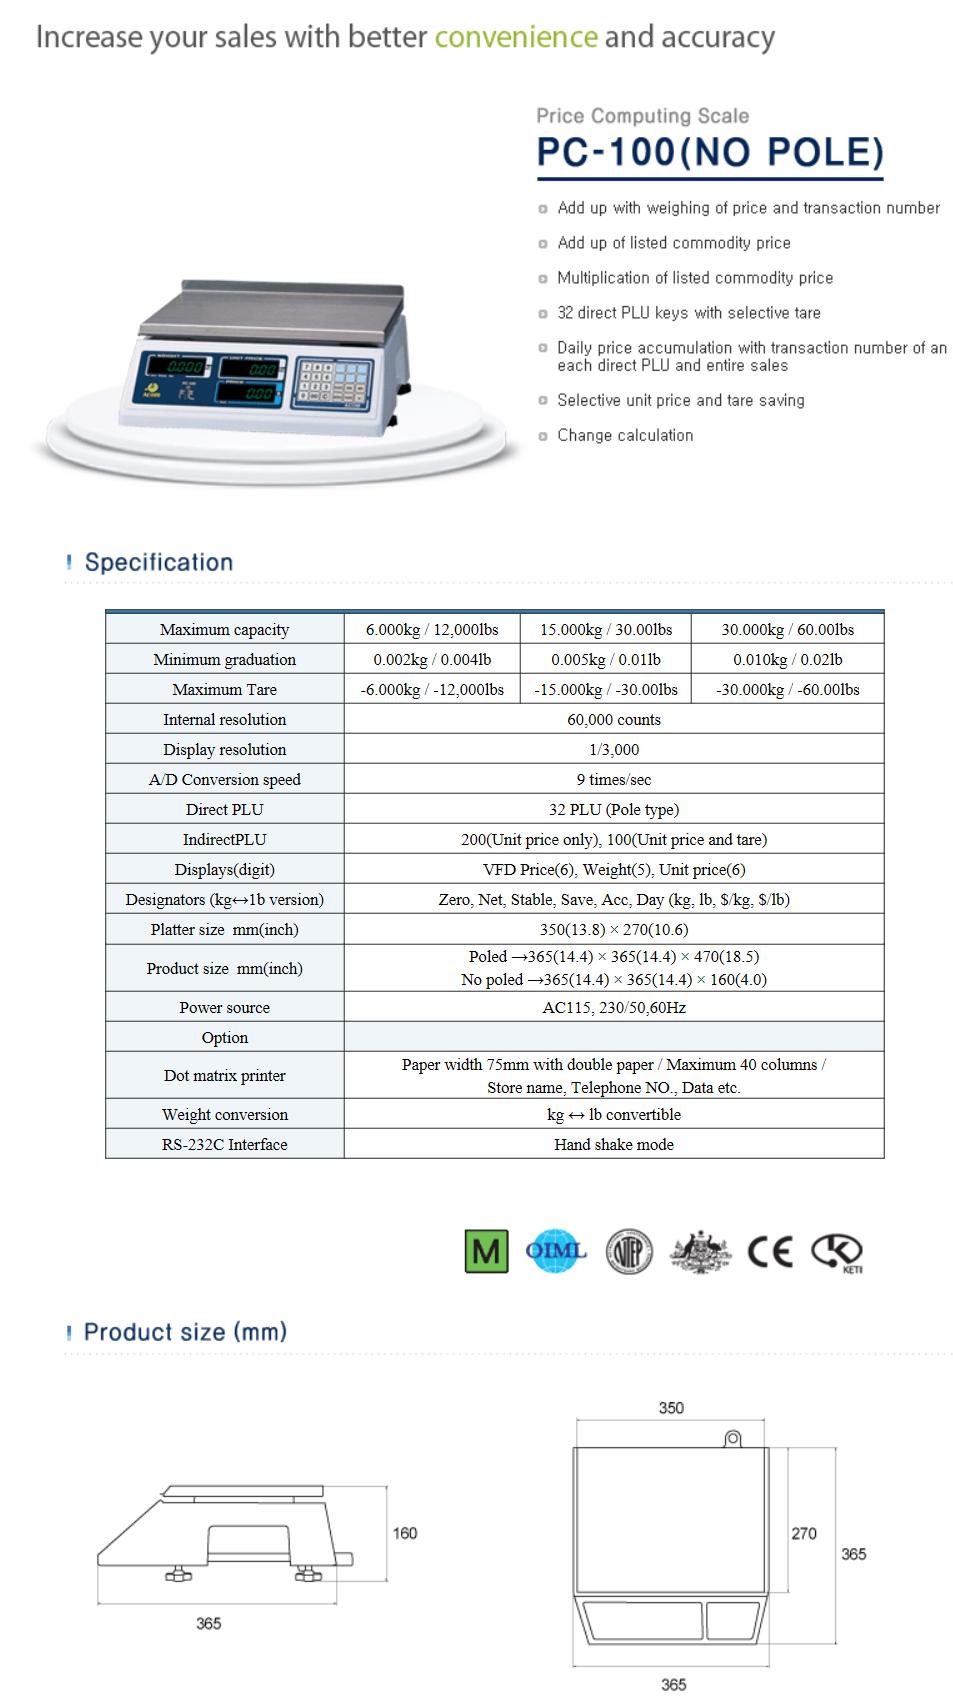 ACOM Price Computing Scale PC-100 (NOPOLE)